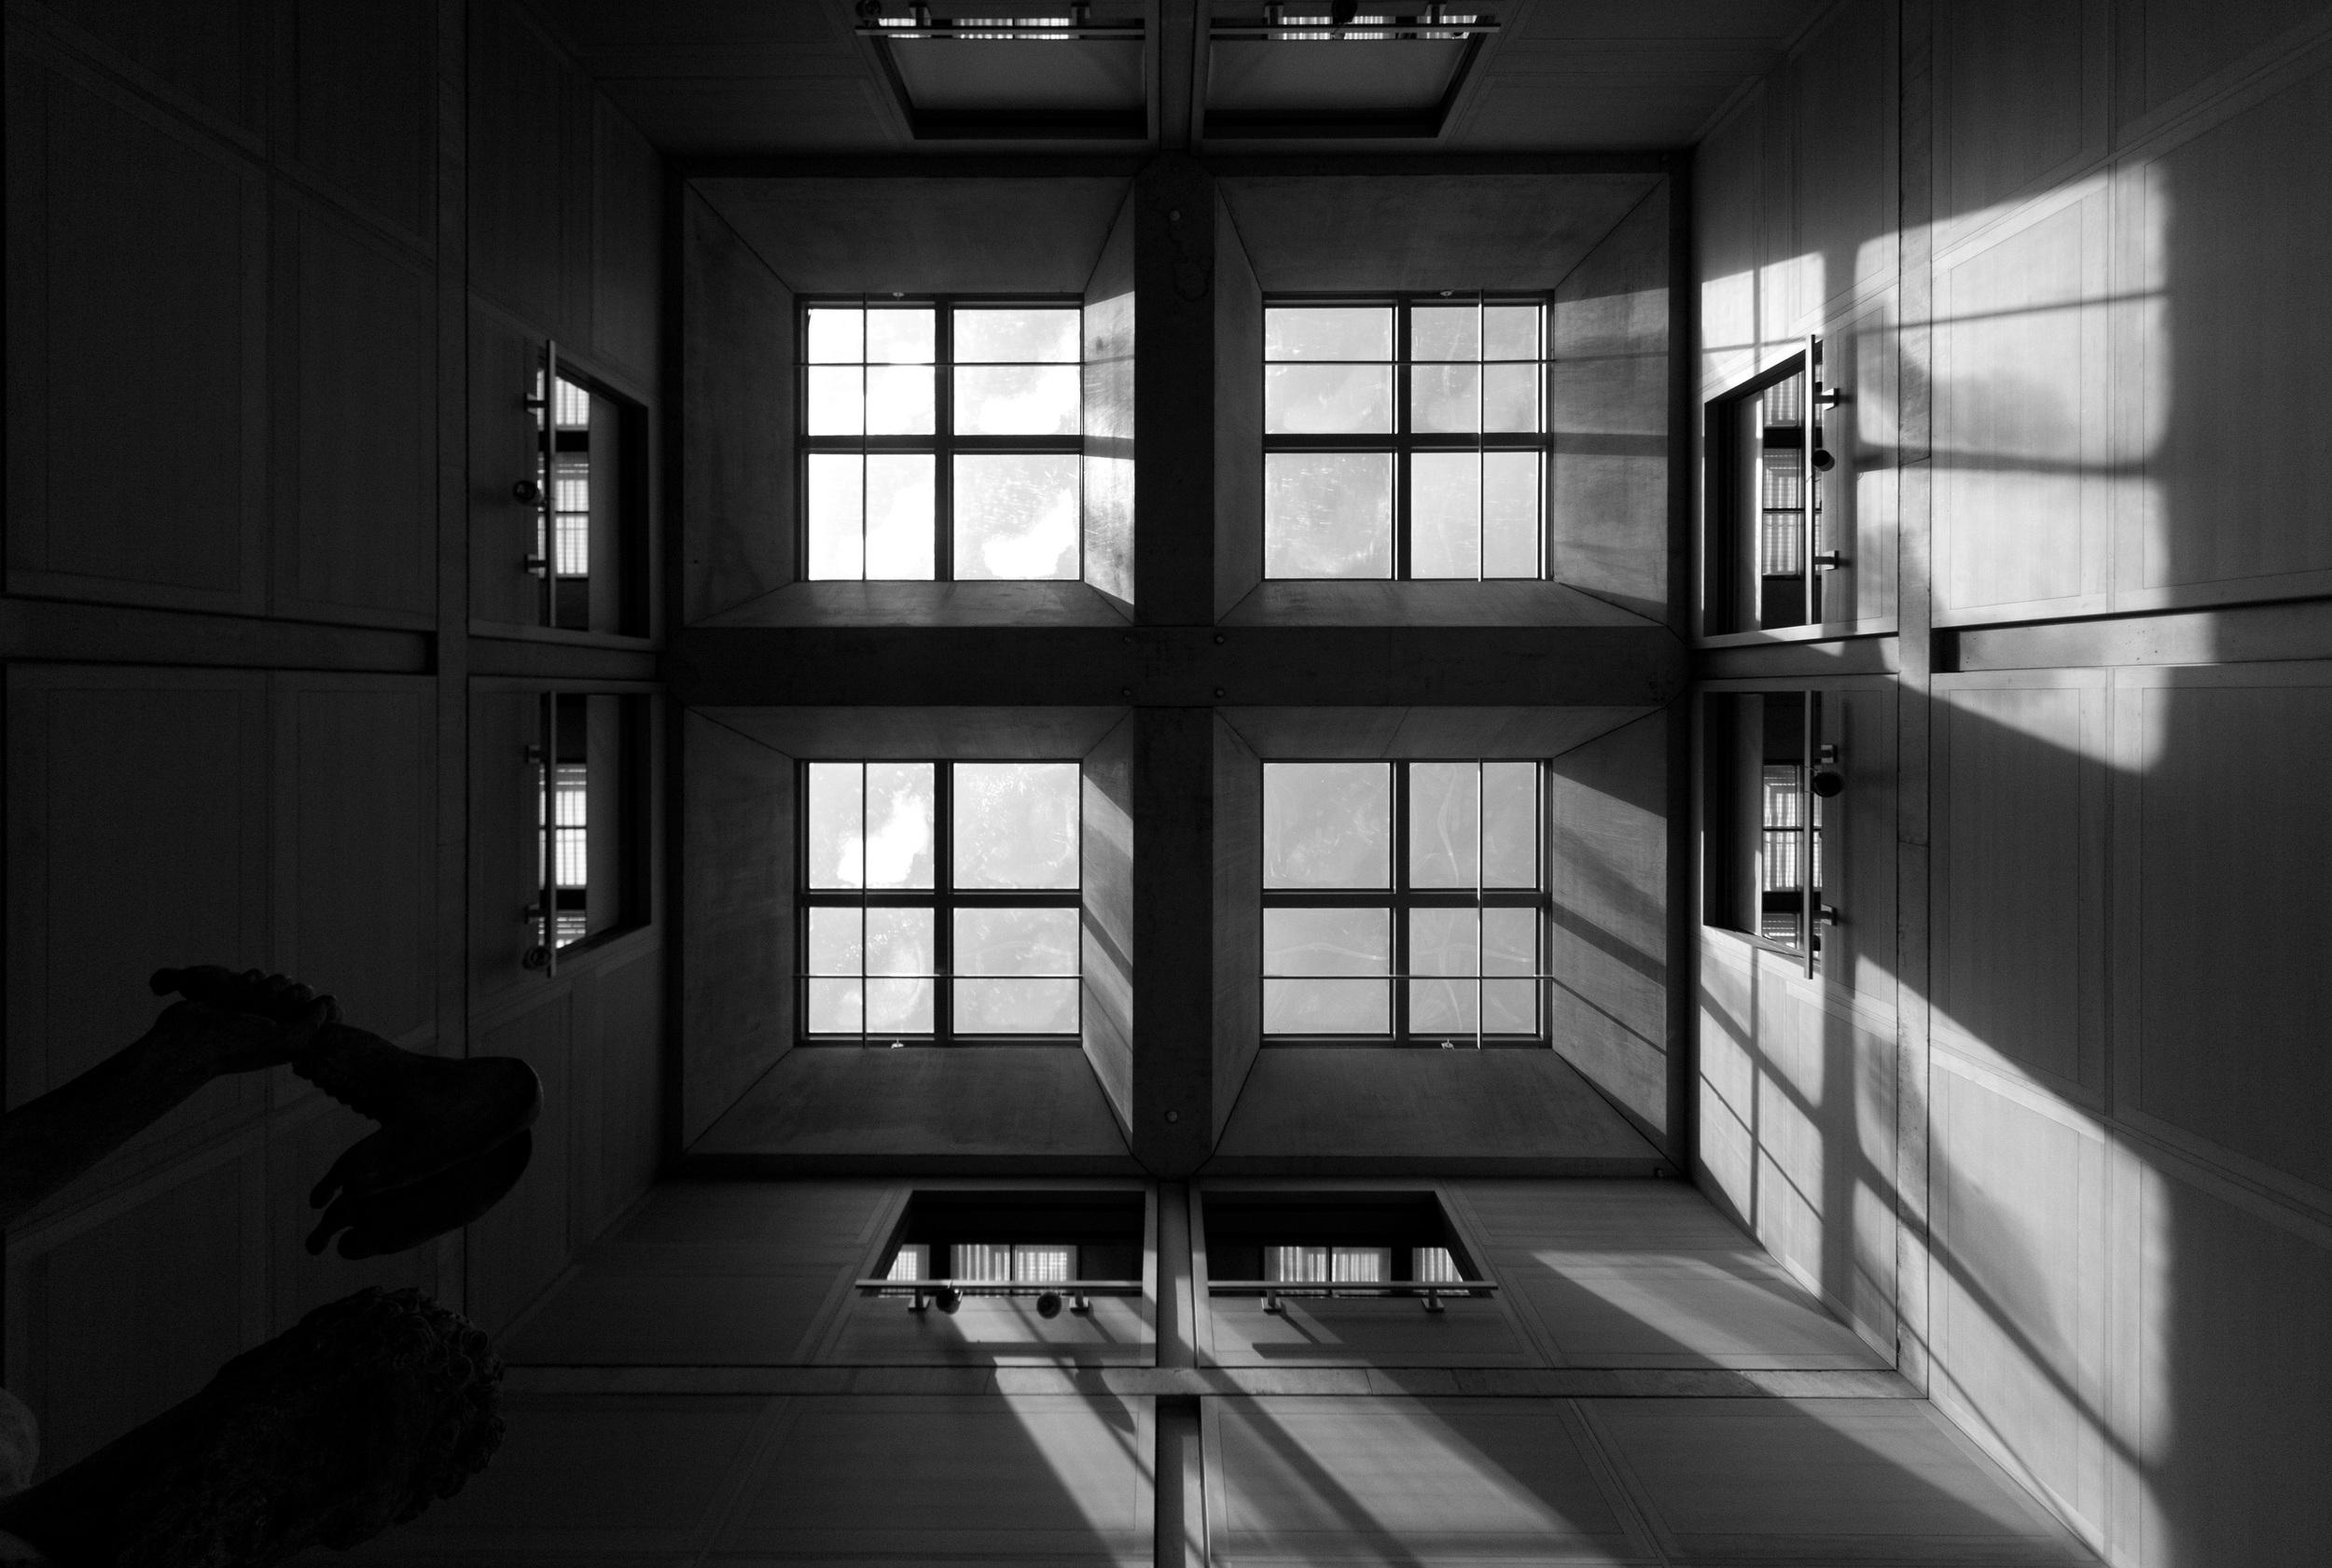 Main Atrium at the Yale Center for British Art